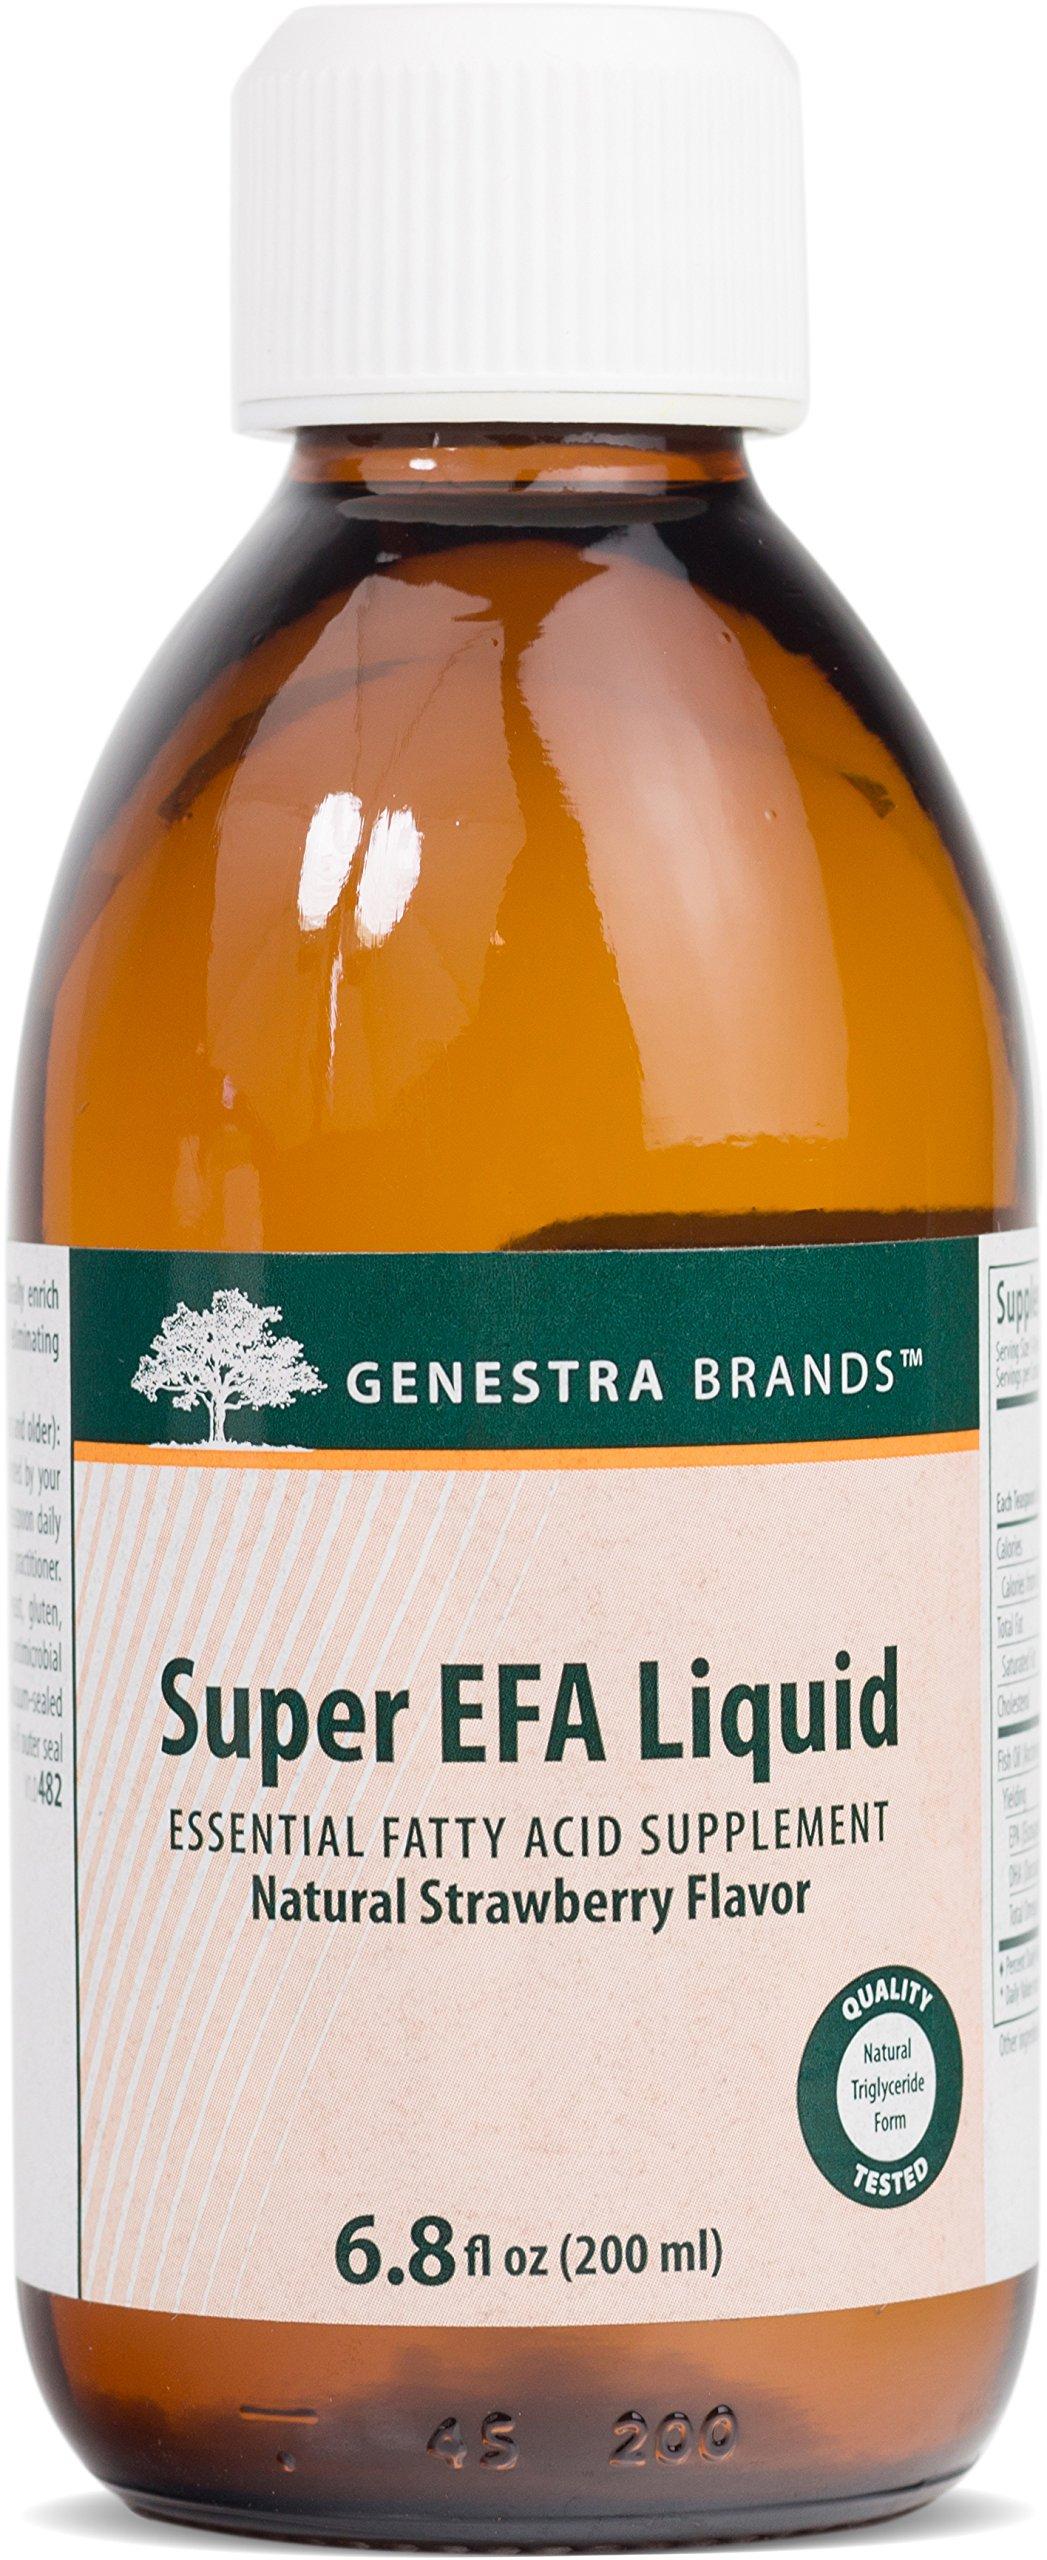 Genestra Brands - Super EFA Liquid - EFA Supplement to Support Cardiovascular, Brain, Eyes, and Nerves* - Natural Strawberry Flavor - 6.8 fl oz (200 ml)